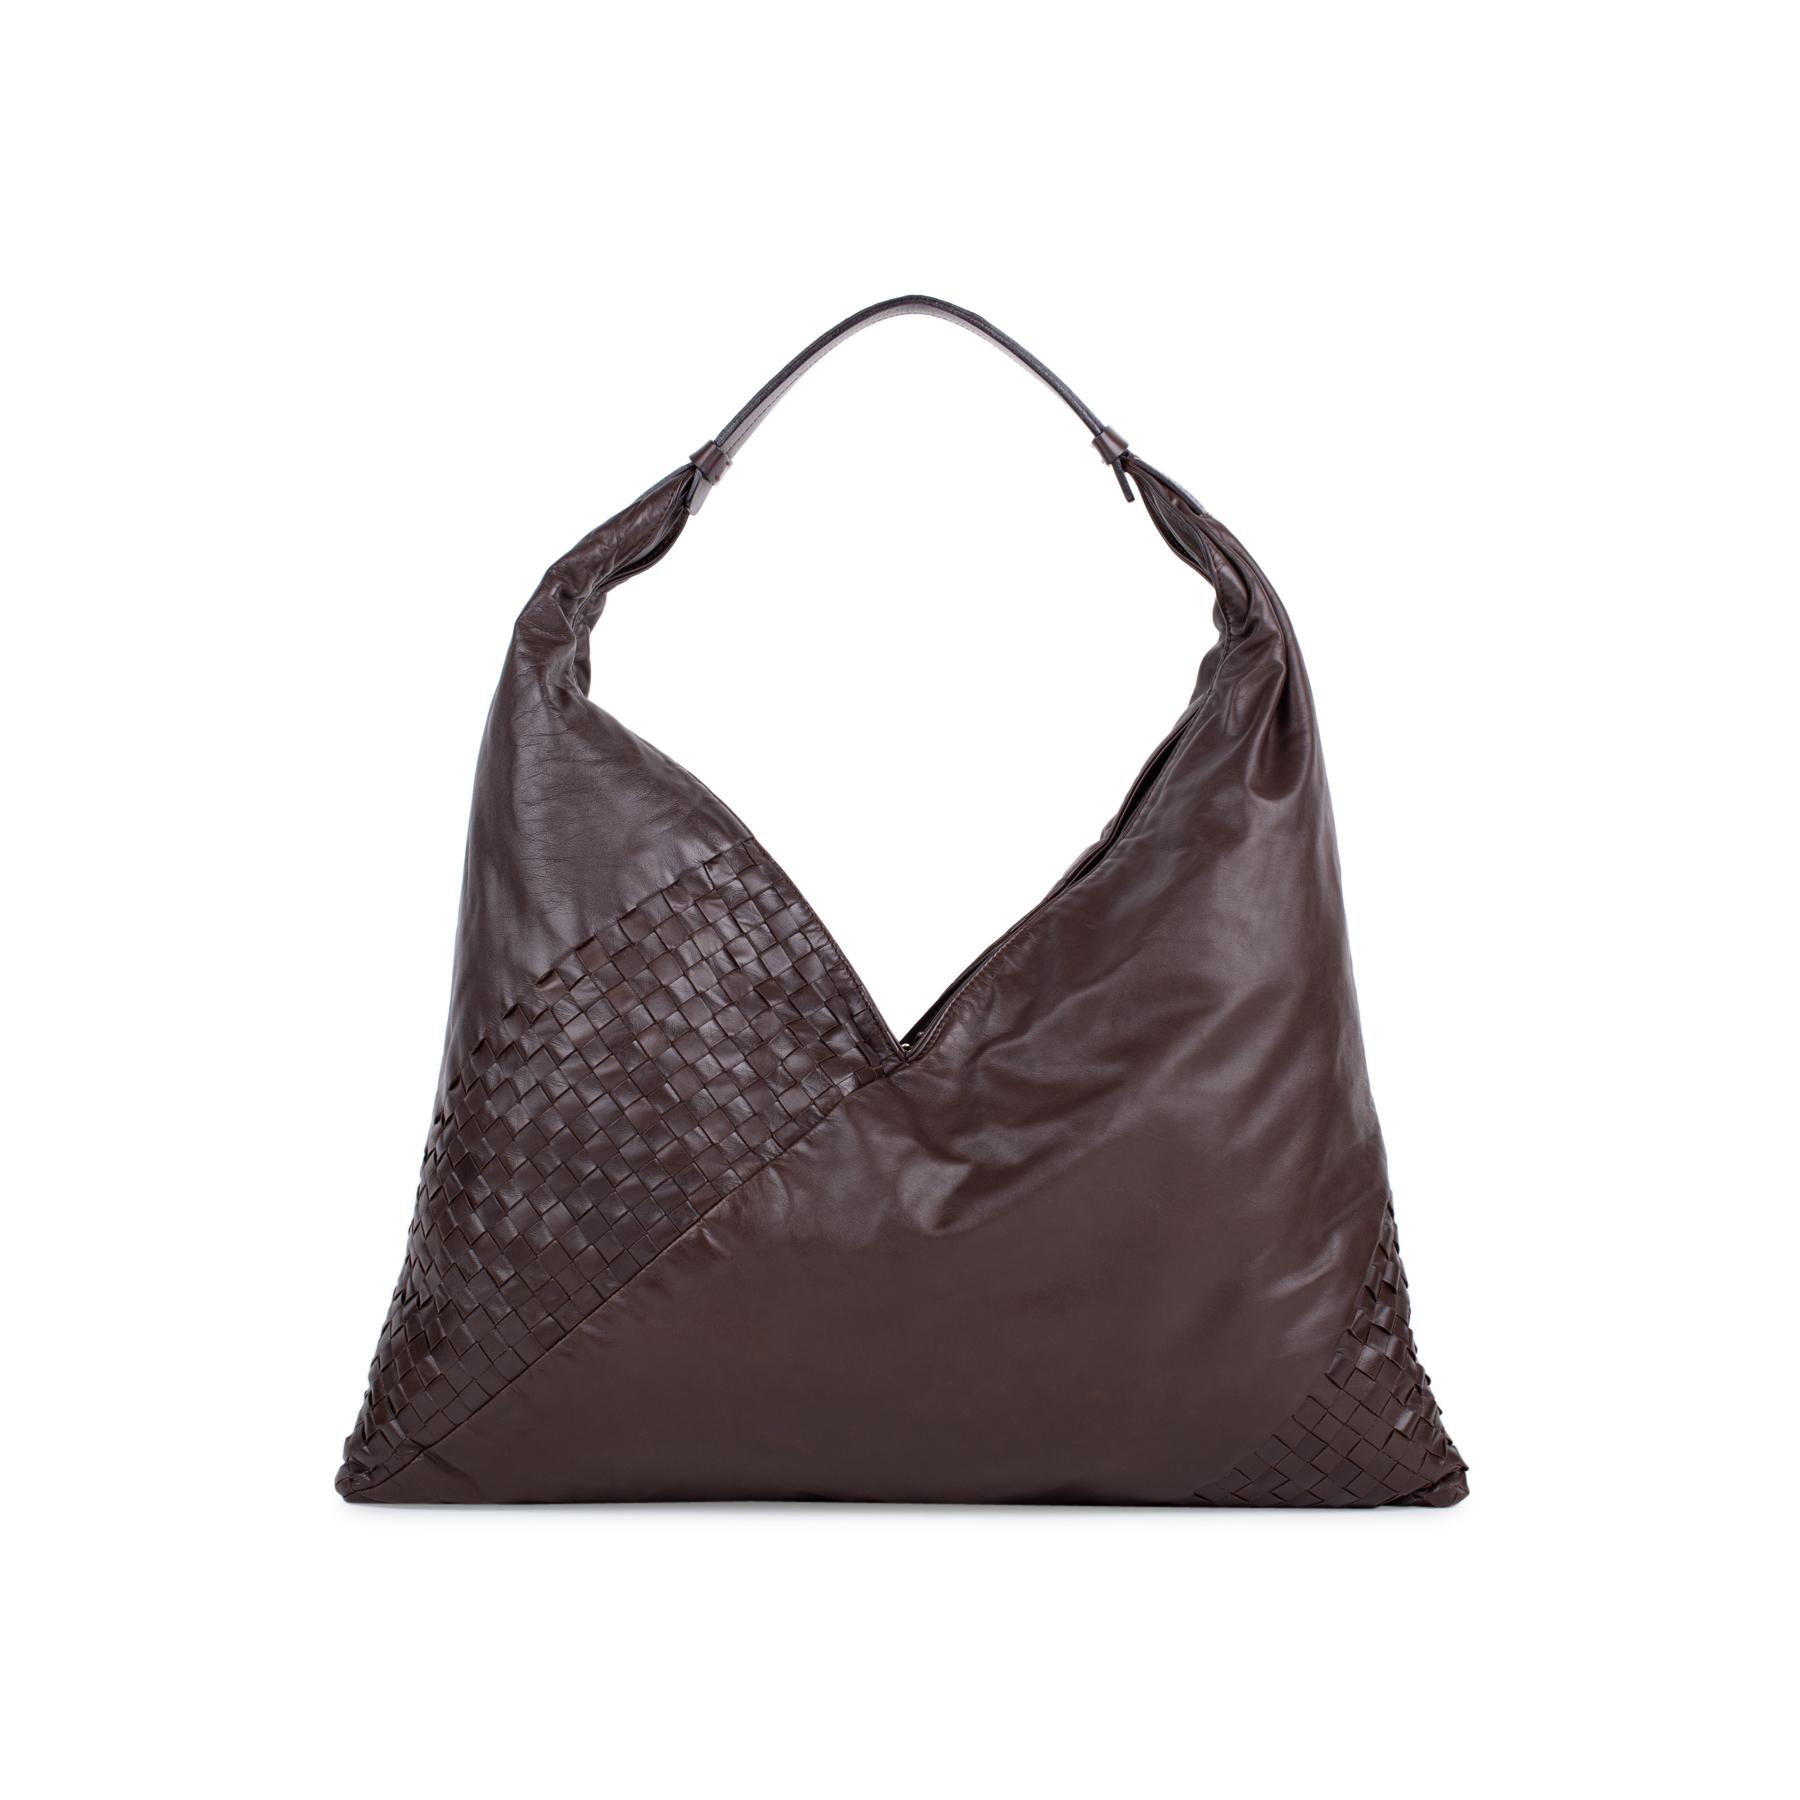 Authentic Second Hand Bottega Veneta Panelled Intrecciato Shoulder Bag  (PSS-537-00003)  a8eb309dd0b74